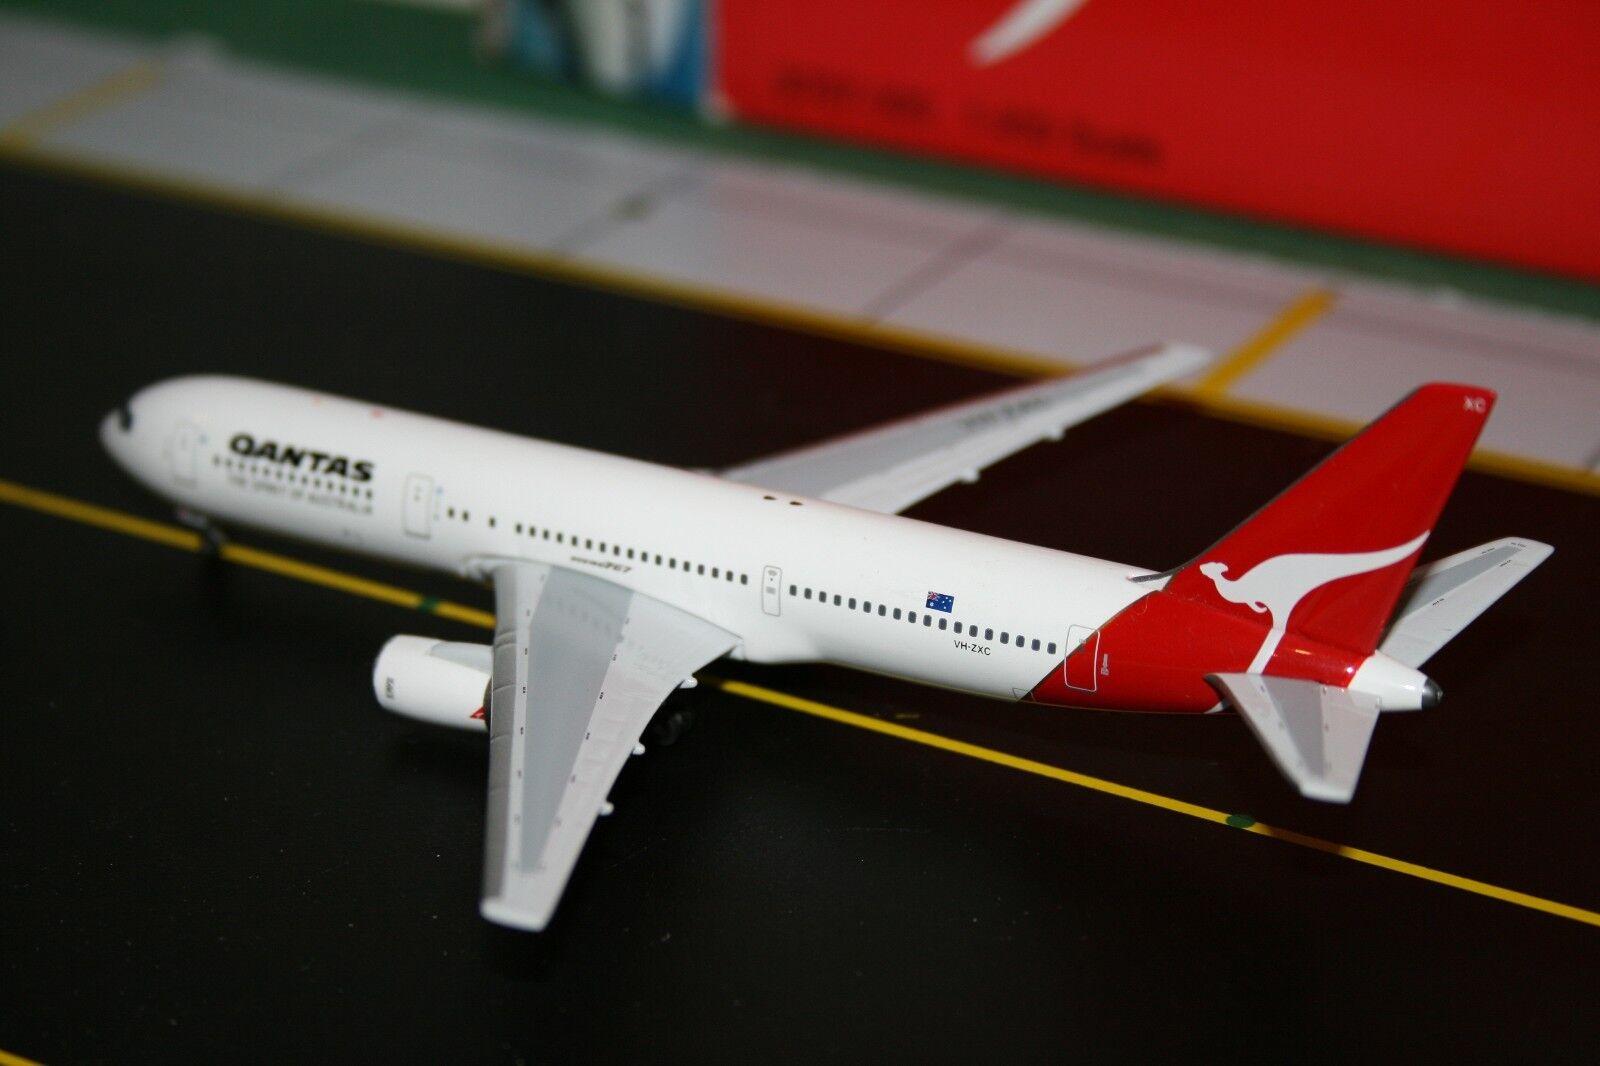 BigBird Big Bird 1 400 Qantas Boeing 767-300 VH-ZXC (BB4-2004-XX) (BB4-2004-XX) (BB4-2004-XX) Model Plane 442d03